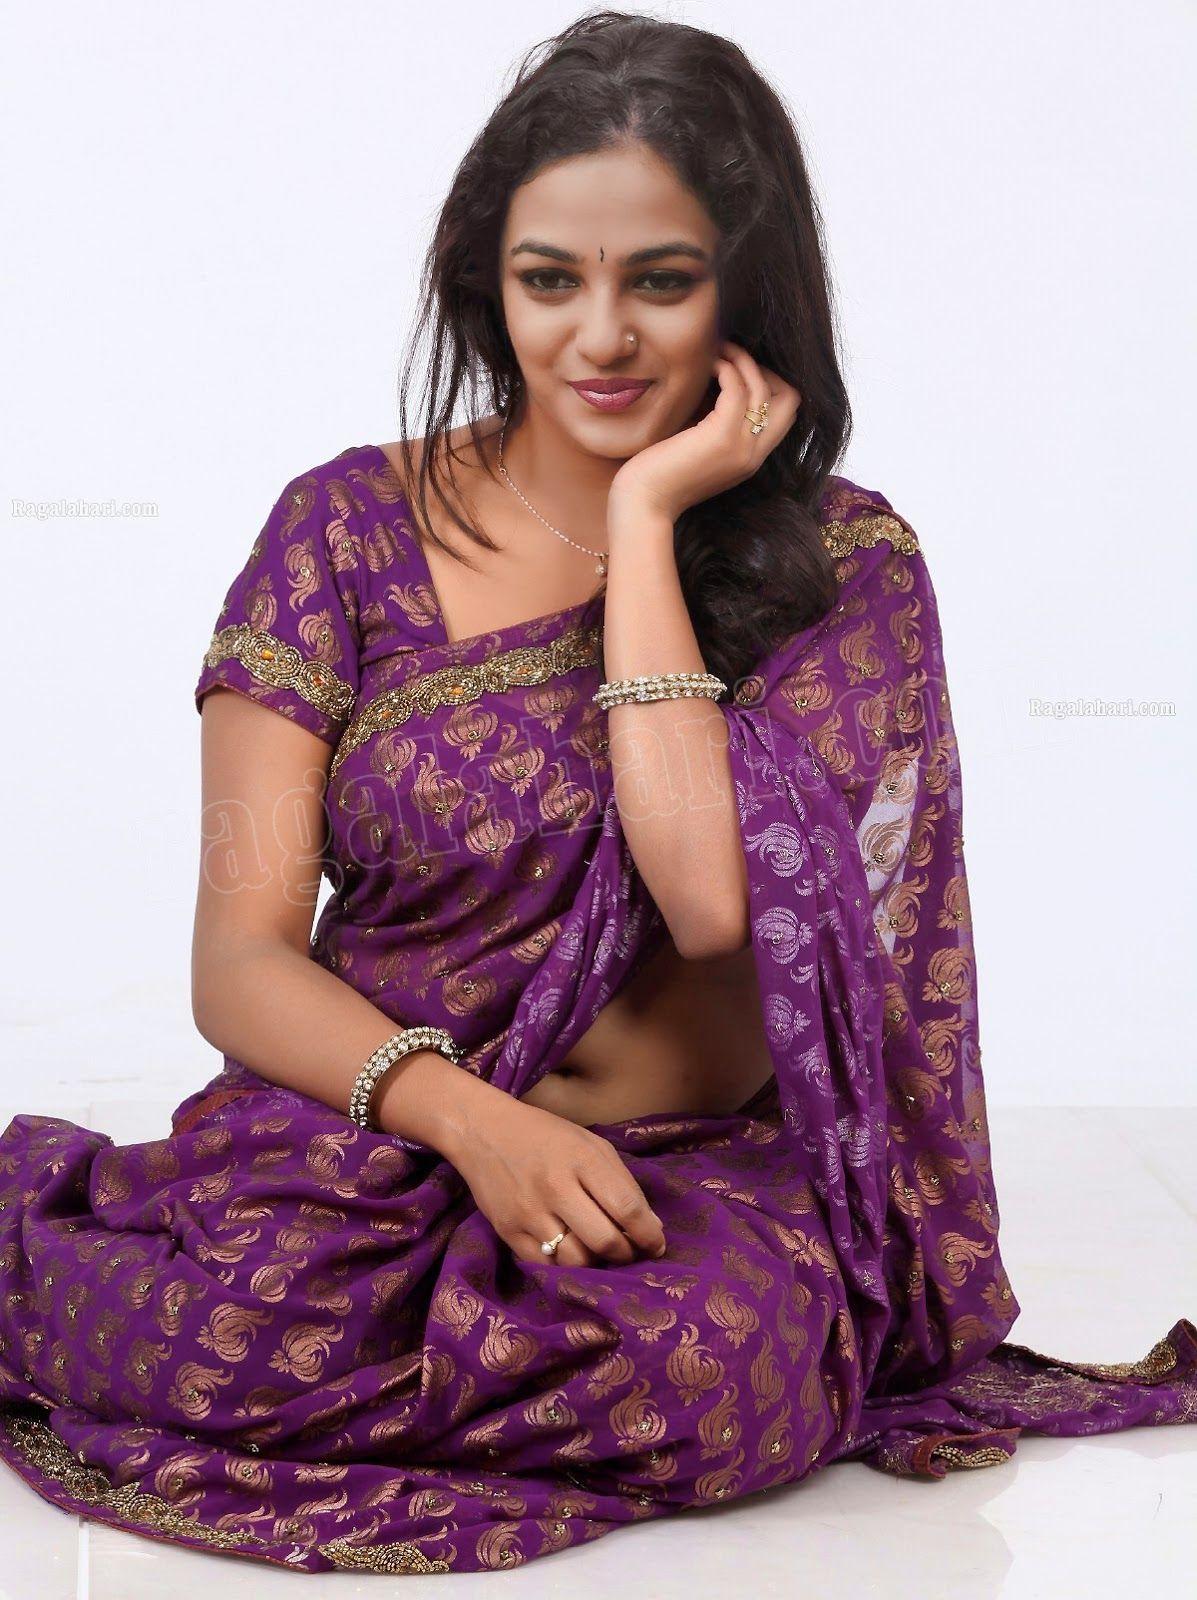 Actress nitya menon nude n fucking herself look like - 5 2